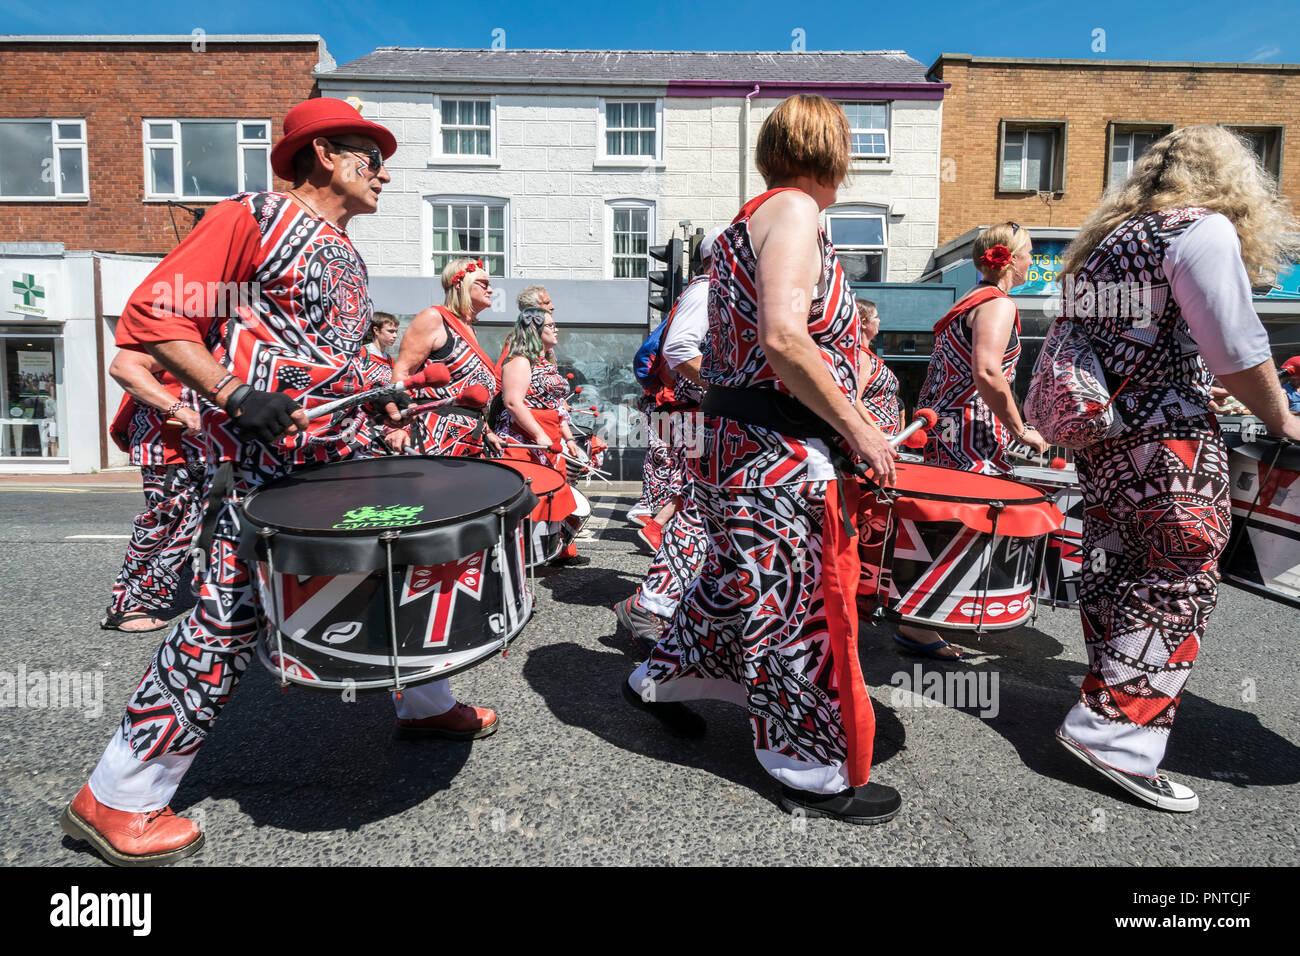 Abergele Carnival Batala Samba band July 14th 2018 on the North Wales coast Stock Photo